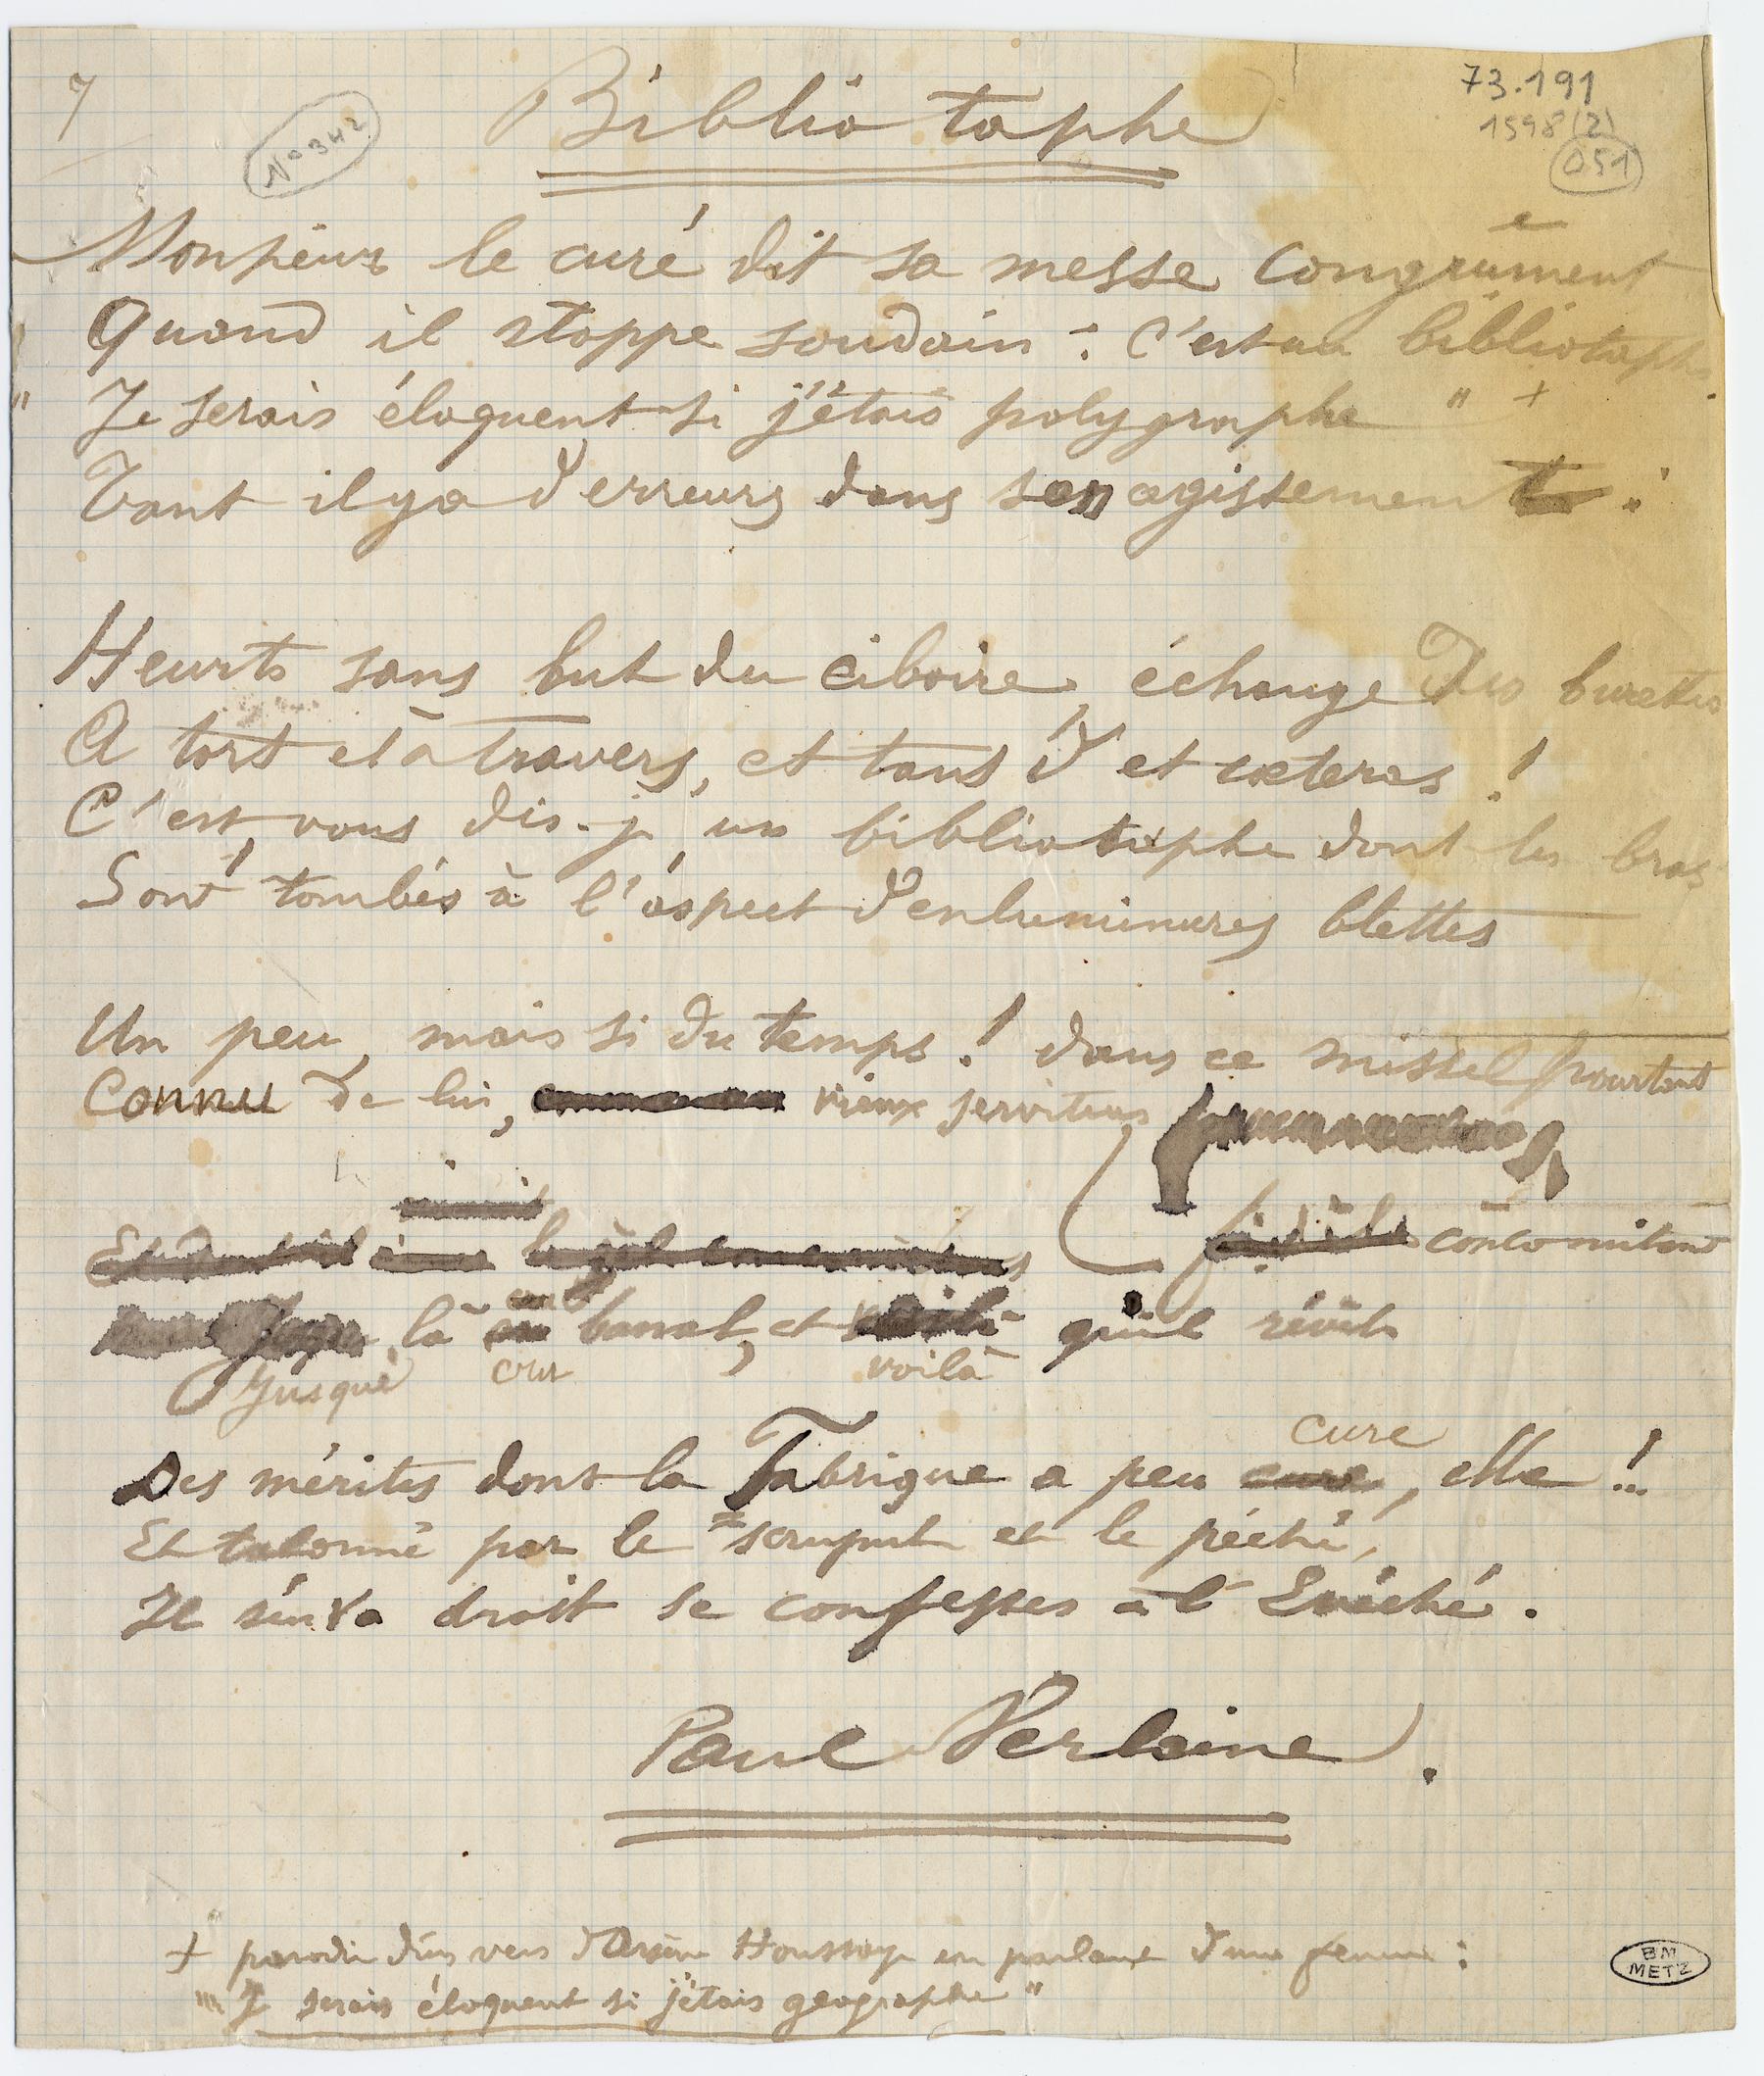 Contenu du «Biblio-taphe», poème manuscrit